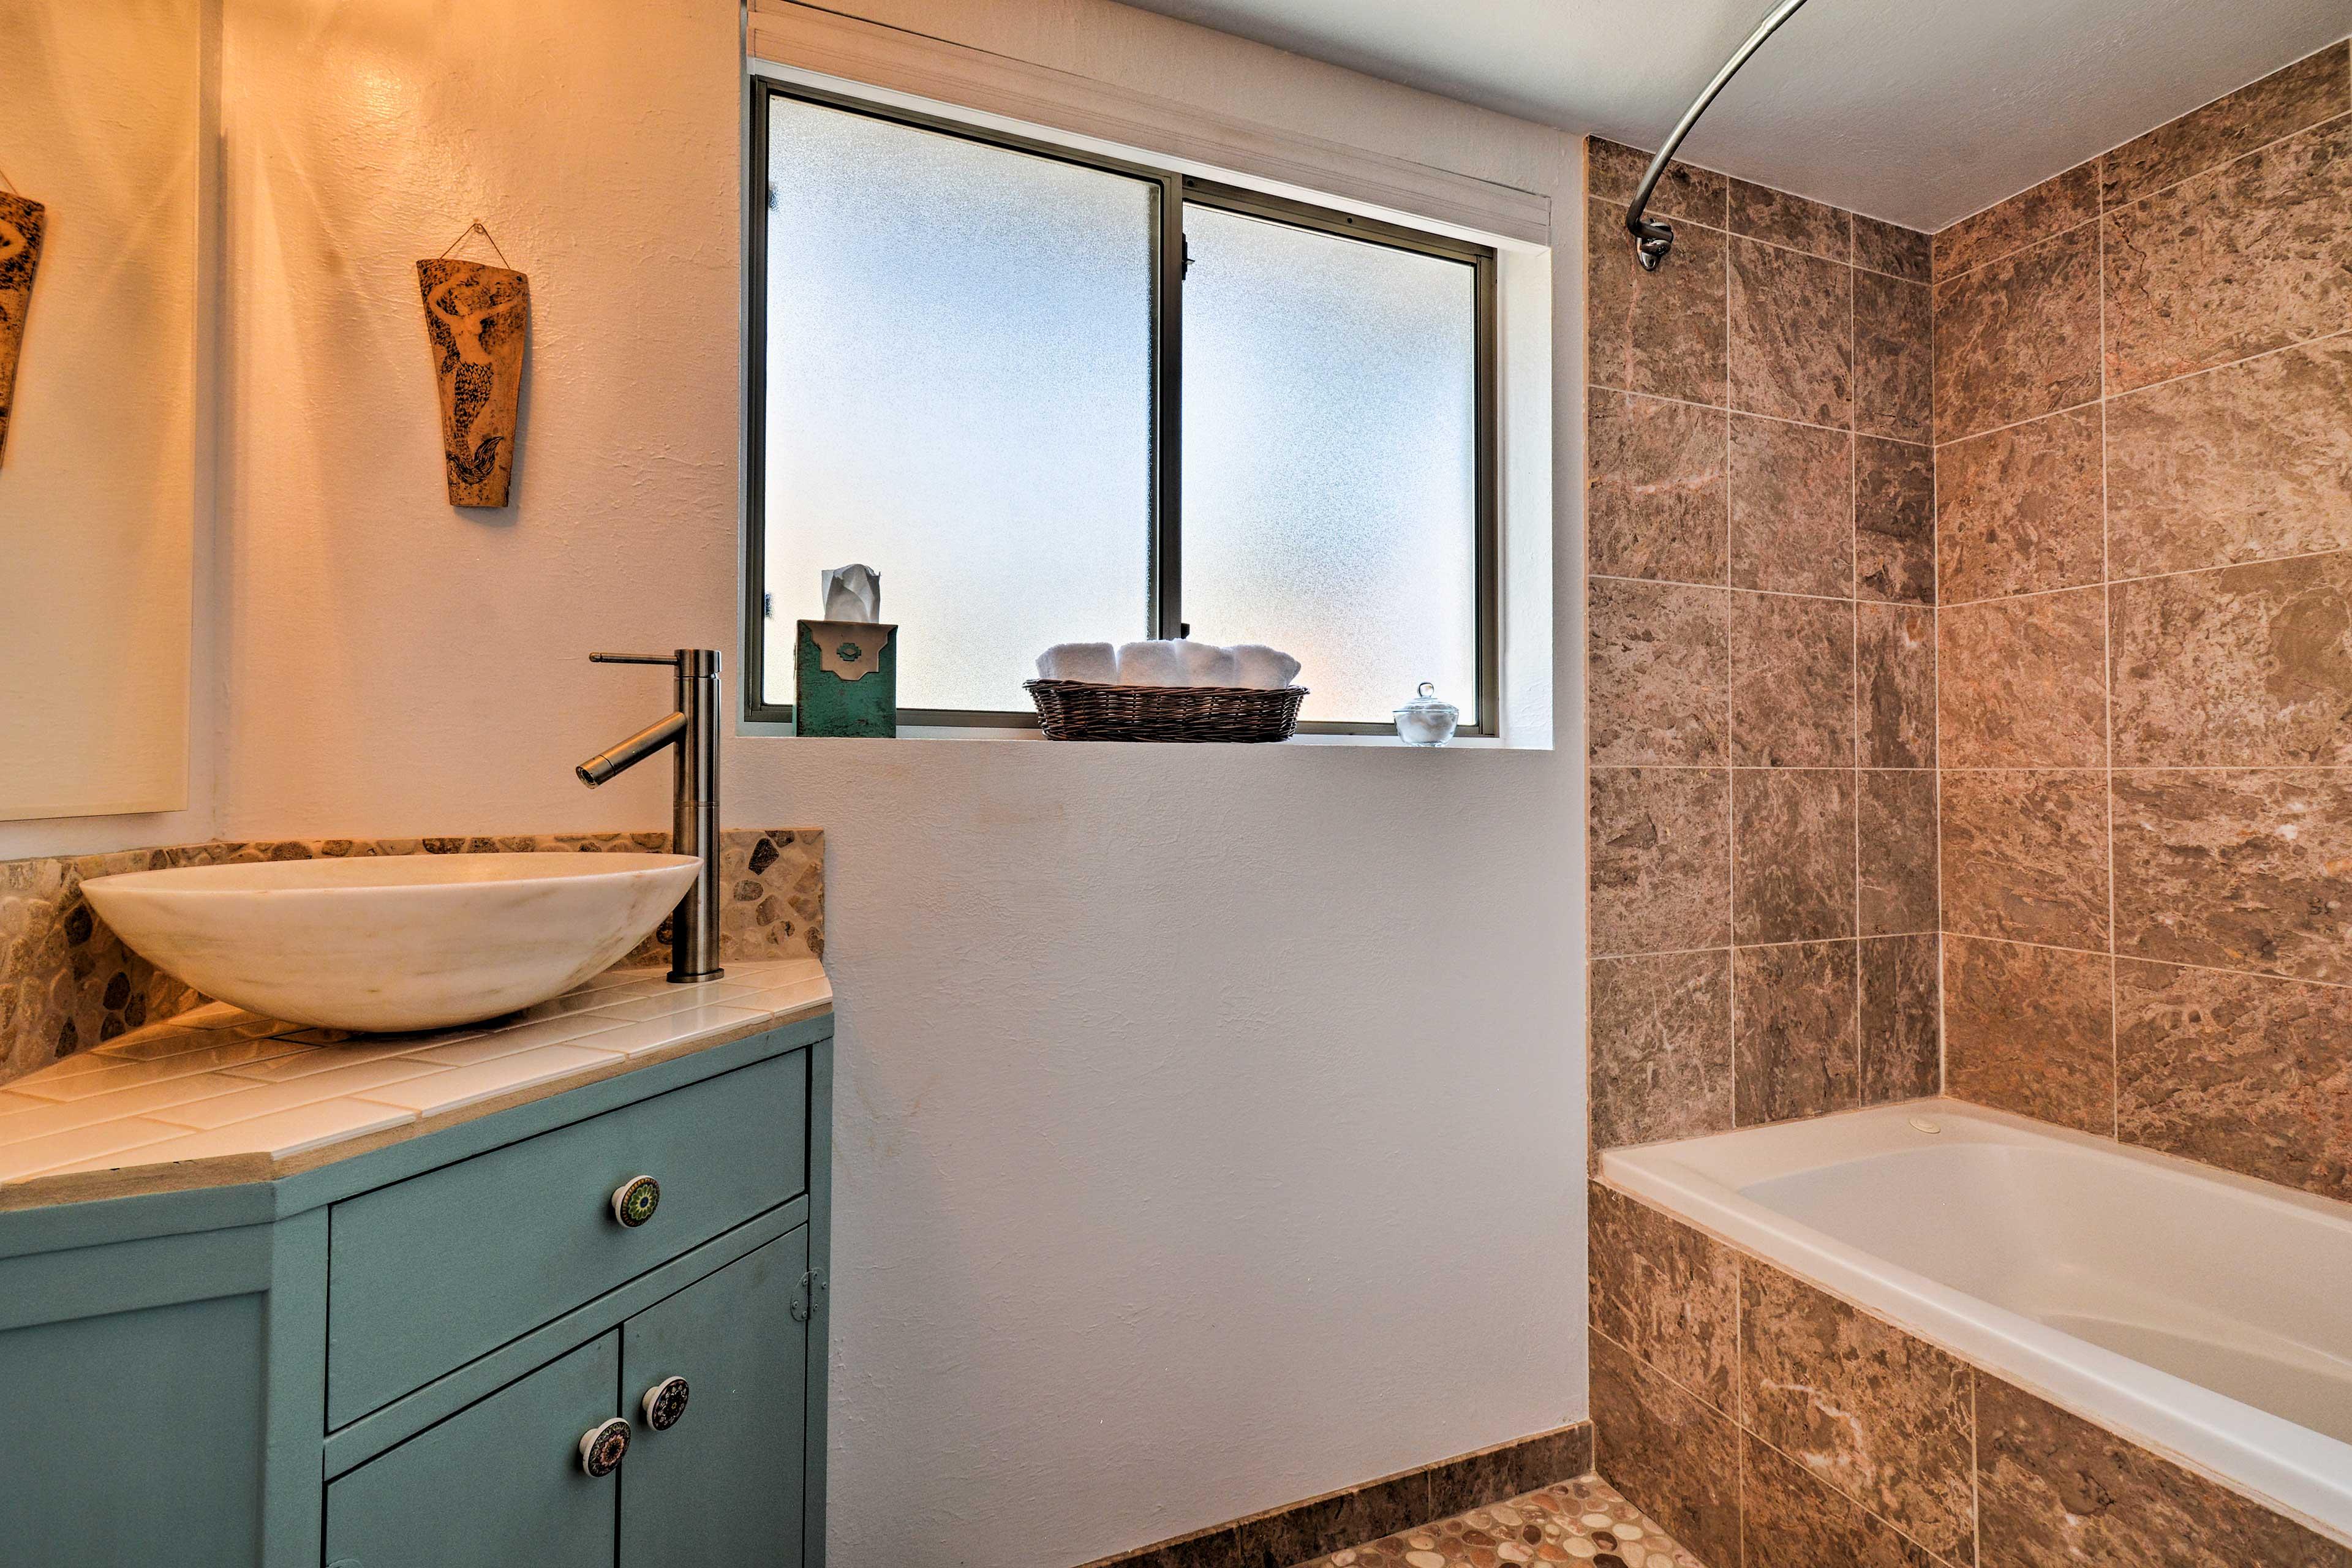 Bathroom 2 | Towels Provided